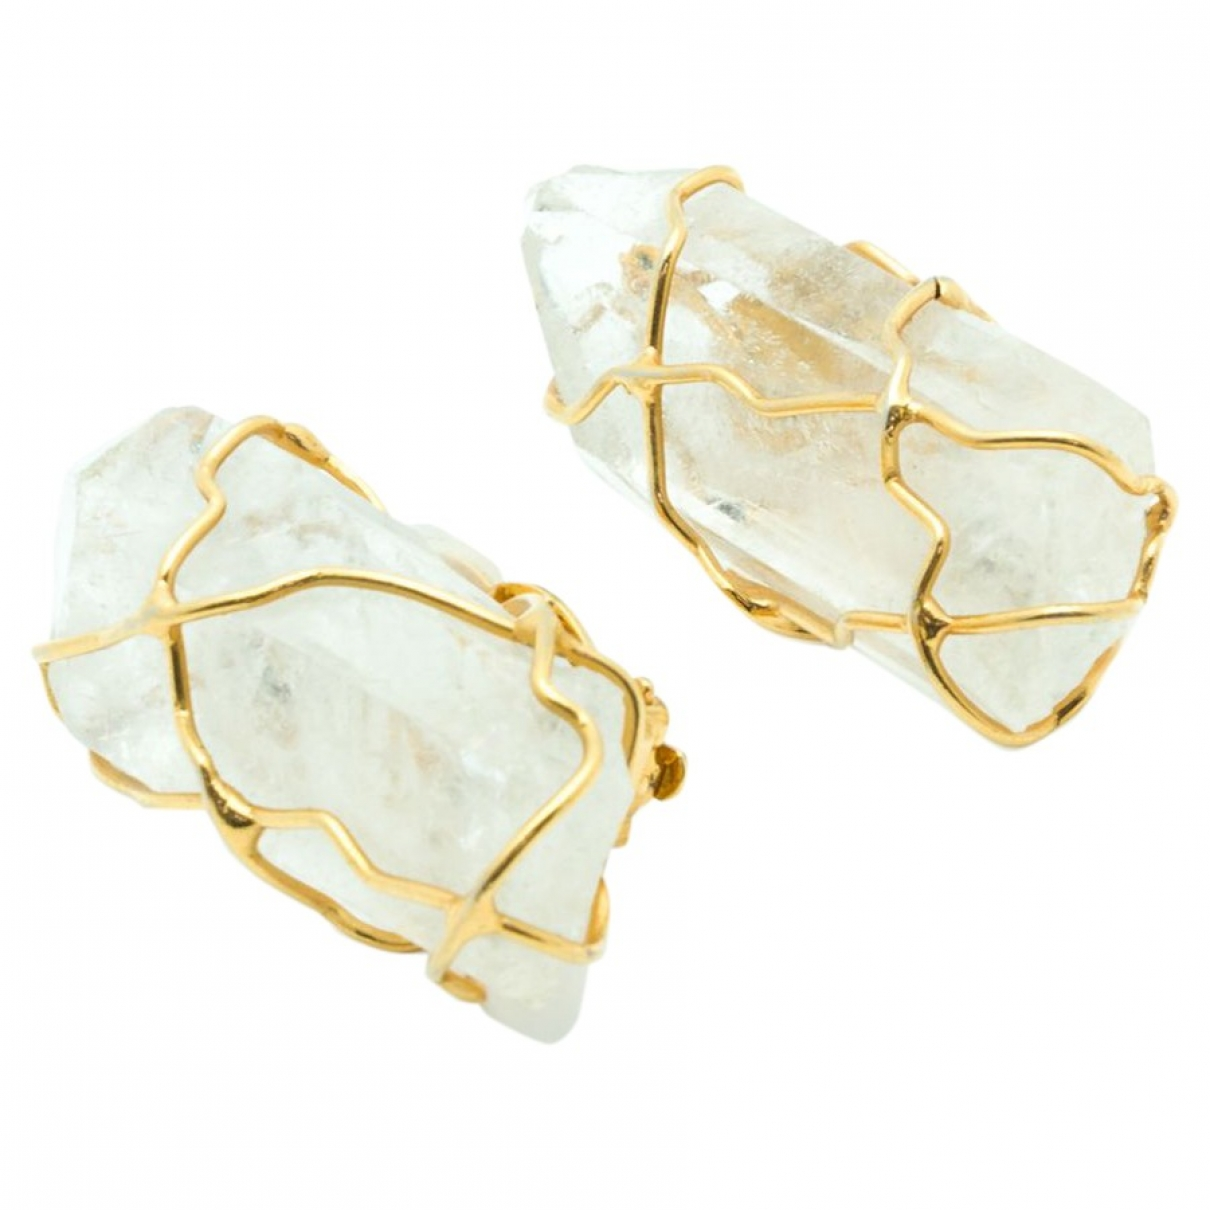 Yves Saint Laurent \N Gold Crystal Earrings for Women \N